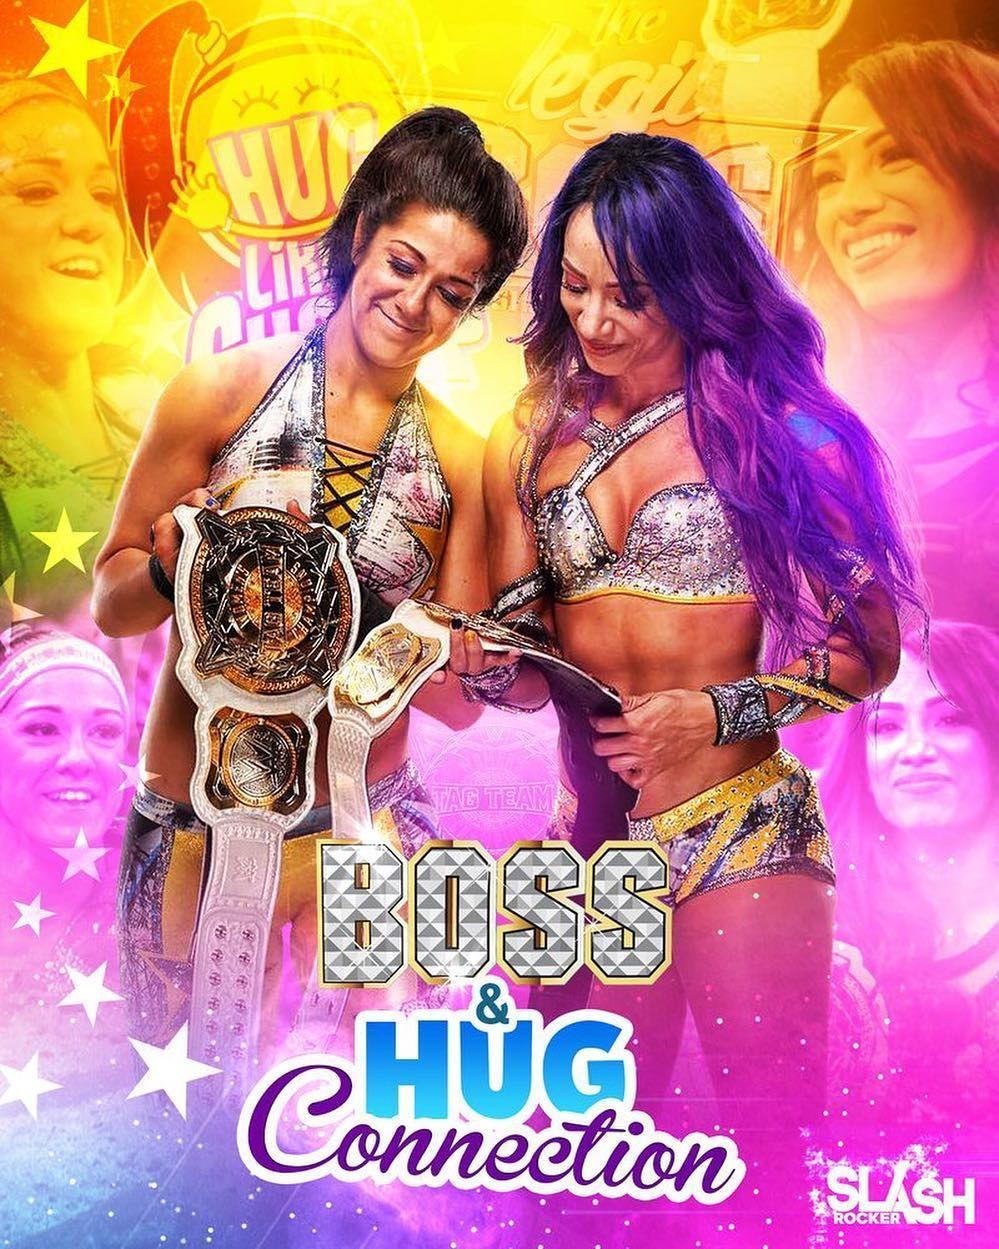 The Boss N Hug Connection Sasha Banks And Bayley Wwe Raw Sdlive Sashabanks Bayley Bossnhugconnect Wwe Divas Bikini Wwe Girls Wwe Female Wrestlers